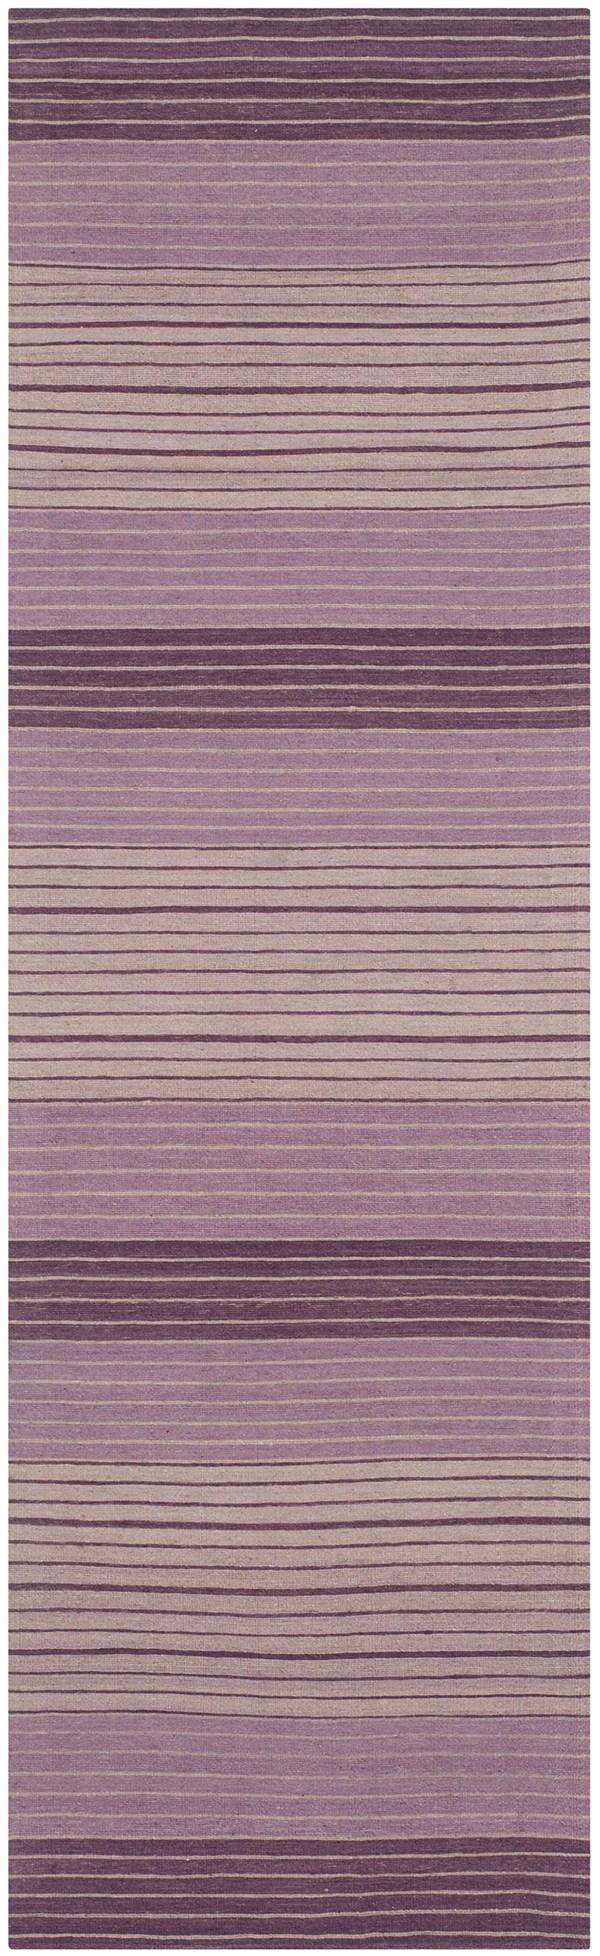 Lilac (A) Striped Area Rug